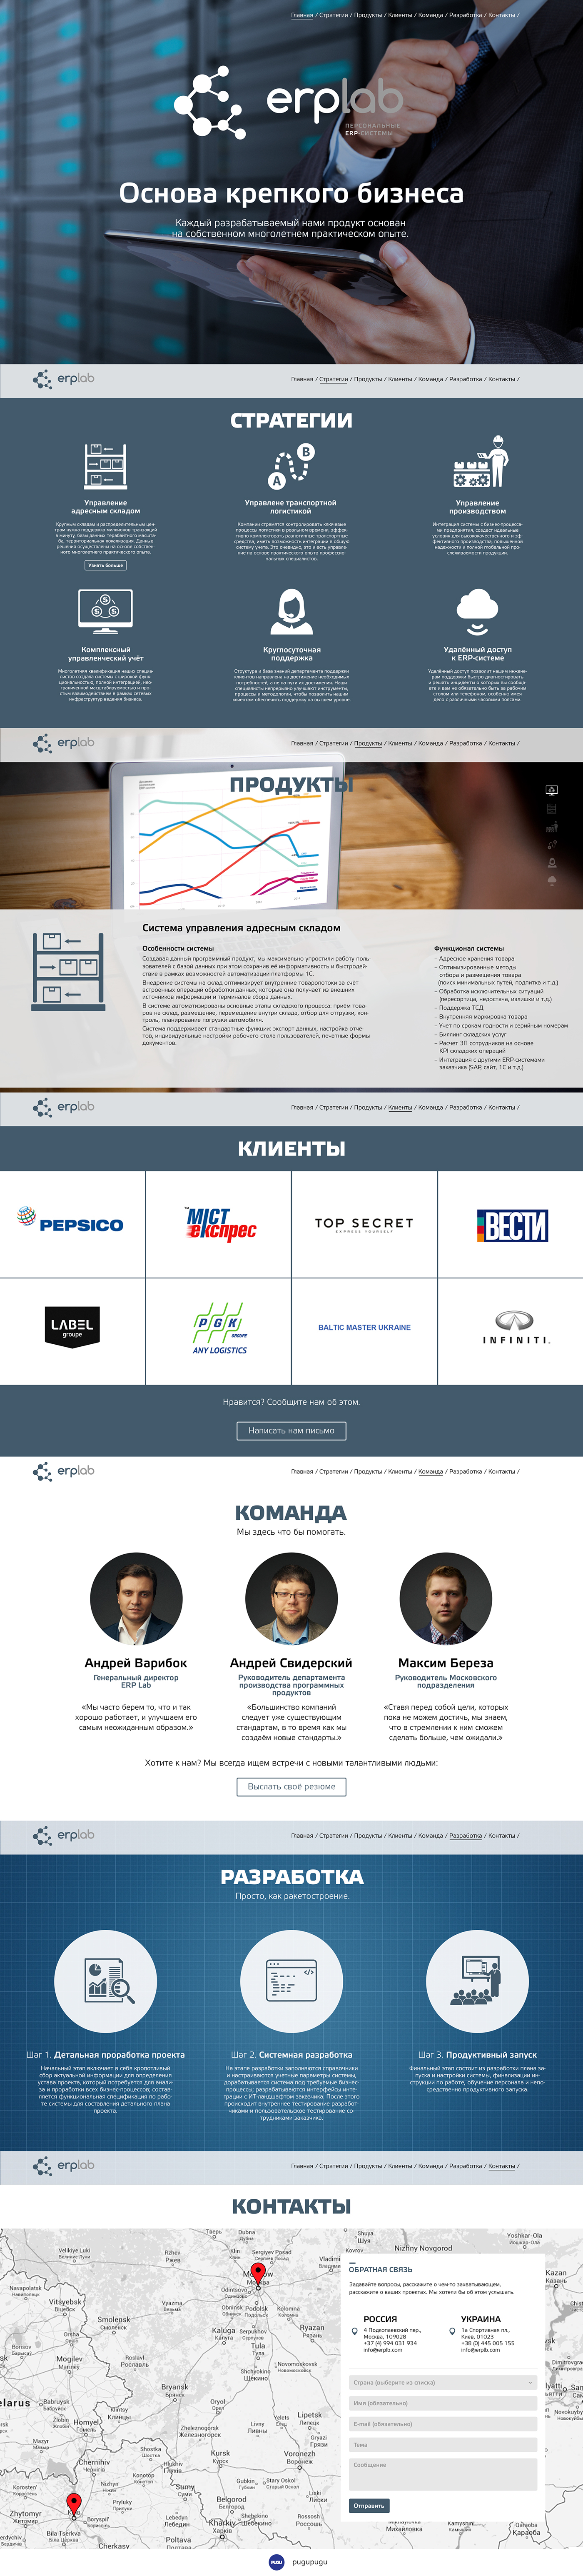 Web-studios in Kiev: a selection of sites